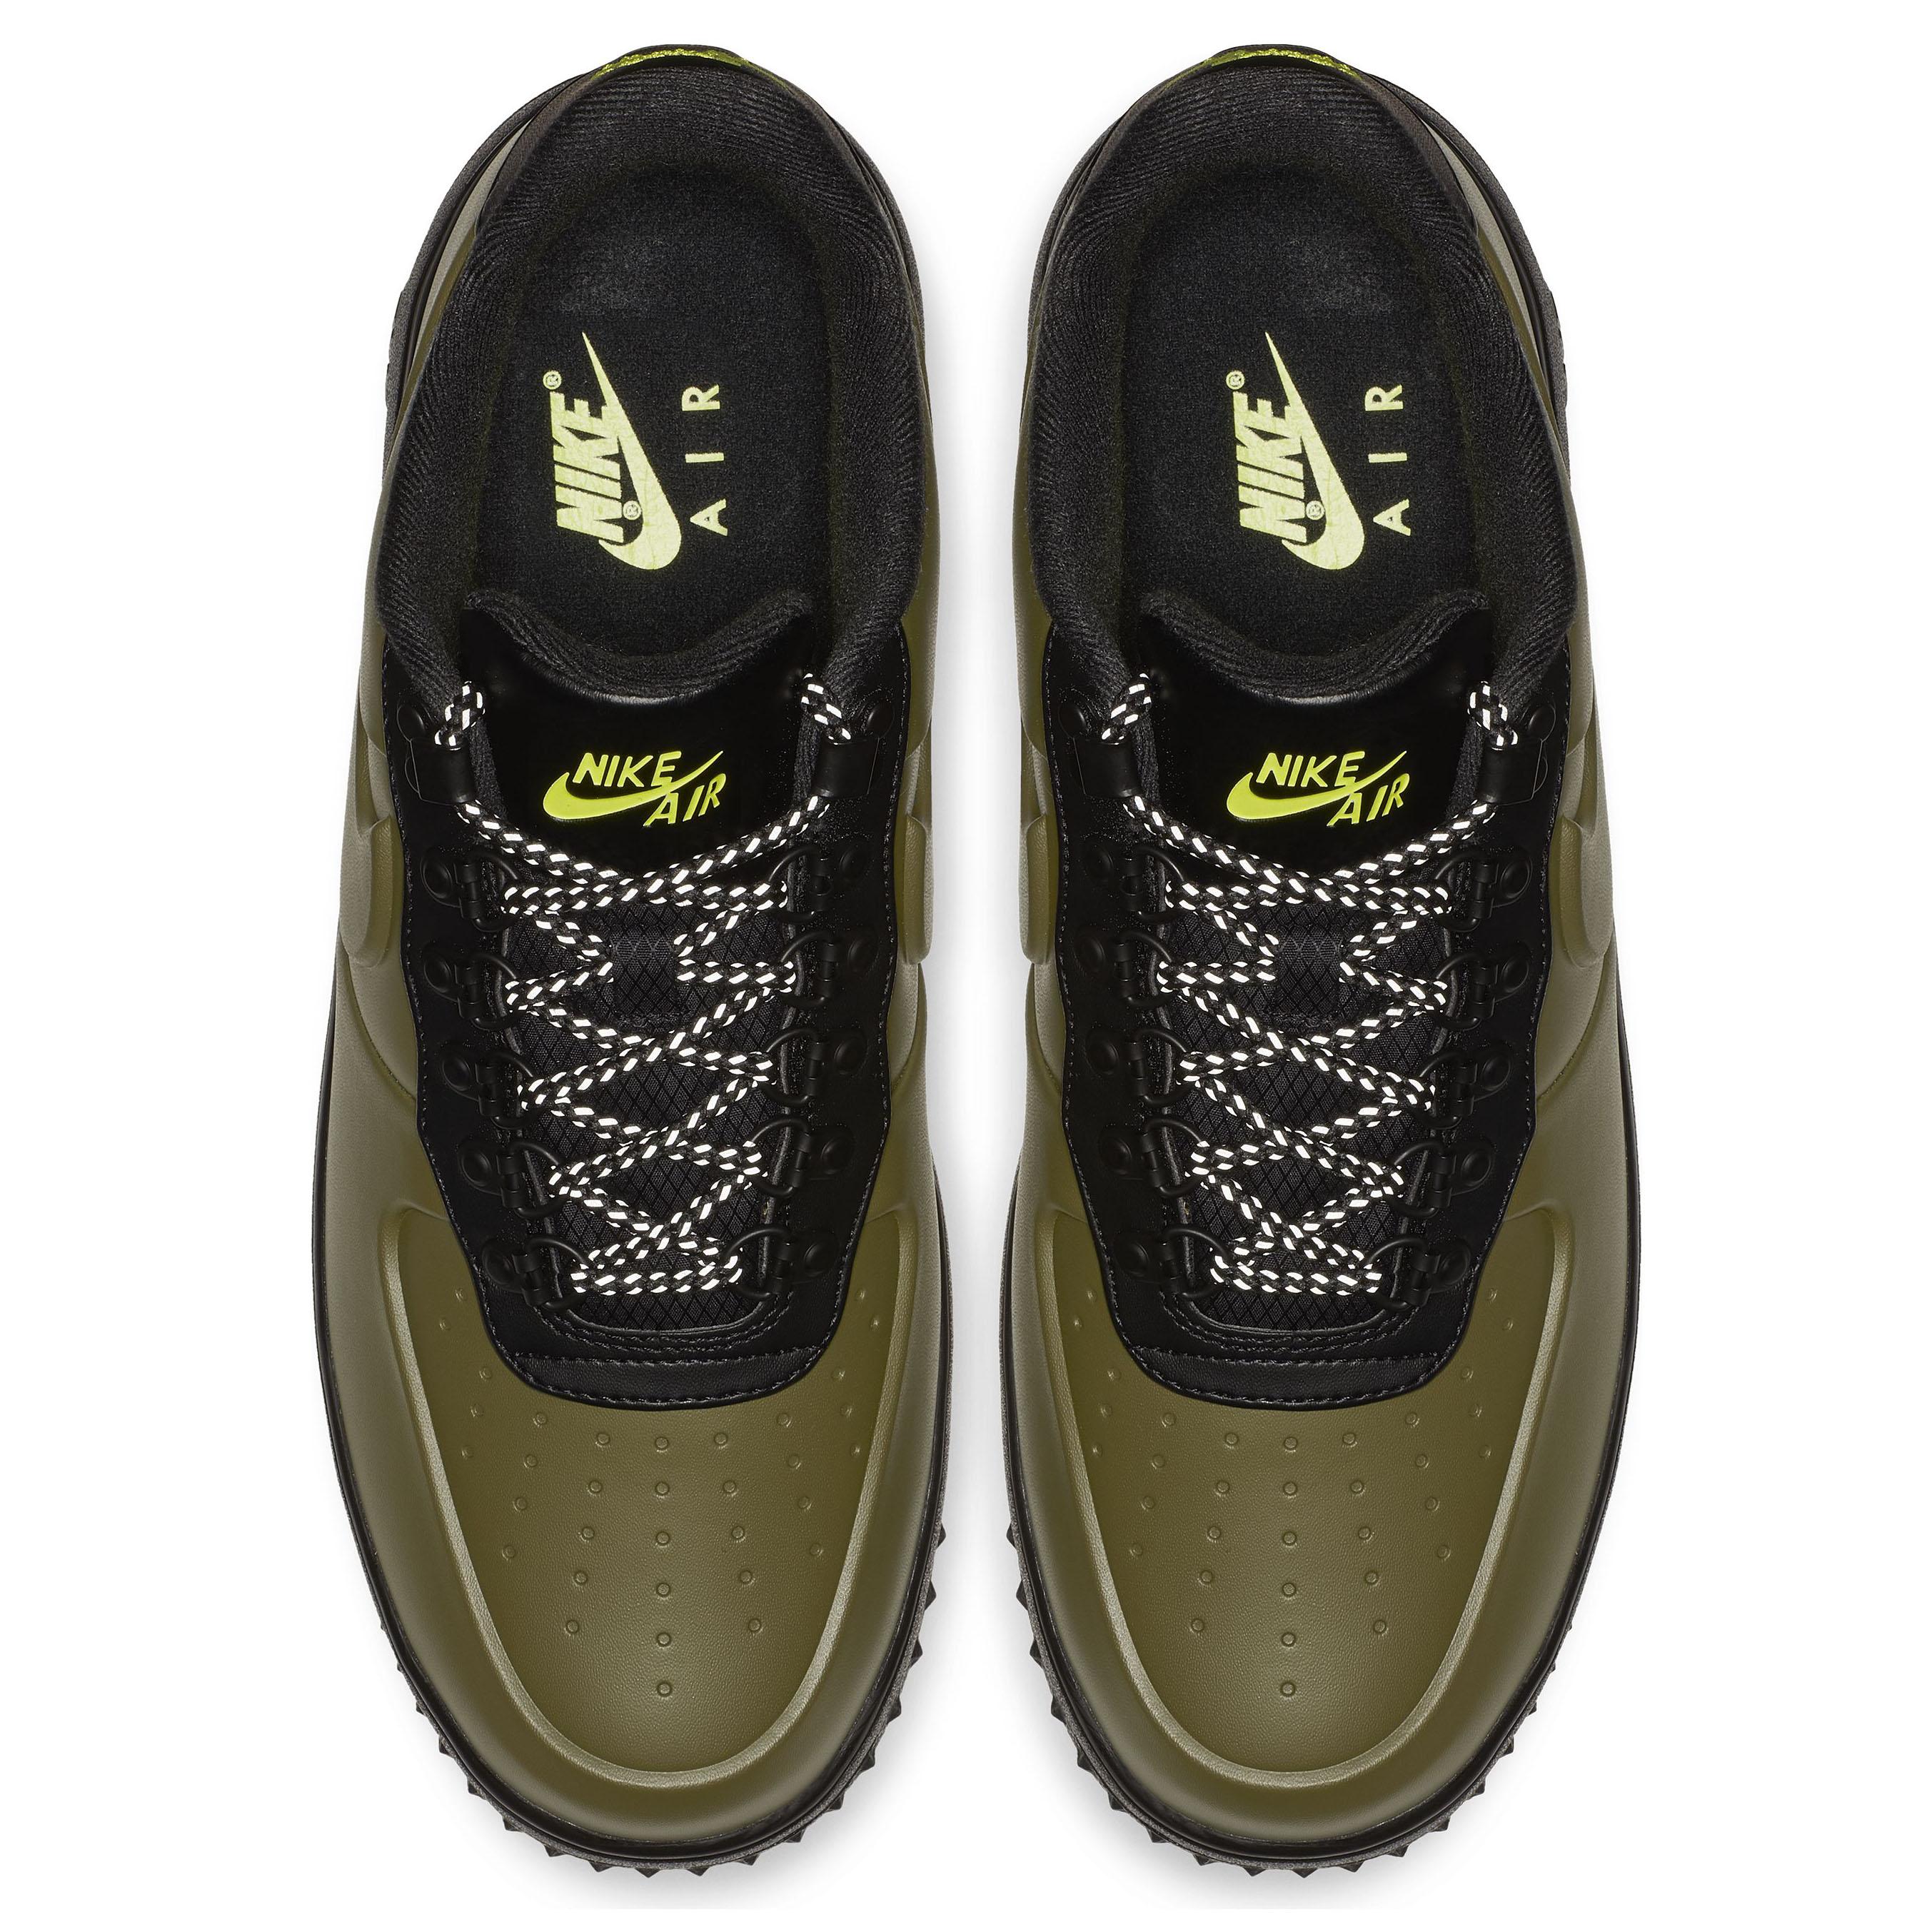 f1cf3ad7 Мужские кроссовки Nike Lunar Force 1 Low Duckboot Olive Canvas/Olive  Canvas-Black-